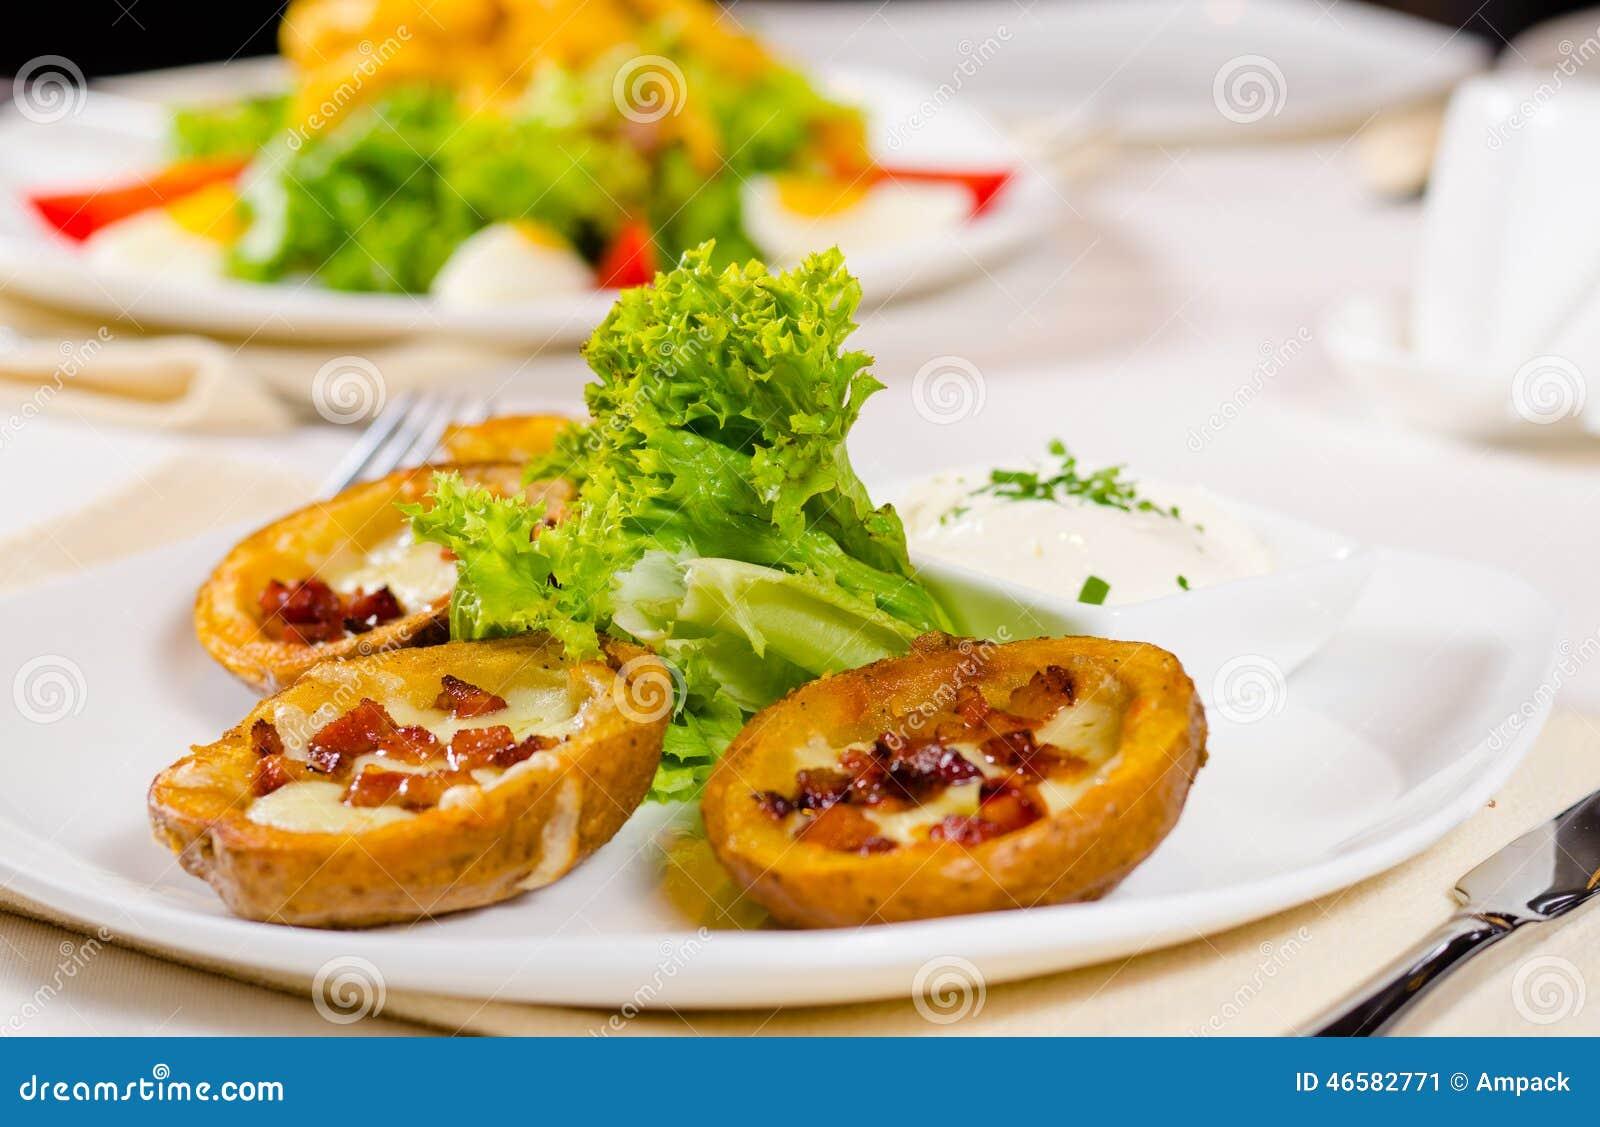 Potato Skins Appetizer With Garnish Stock Photo Image